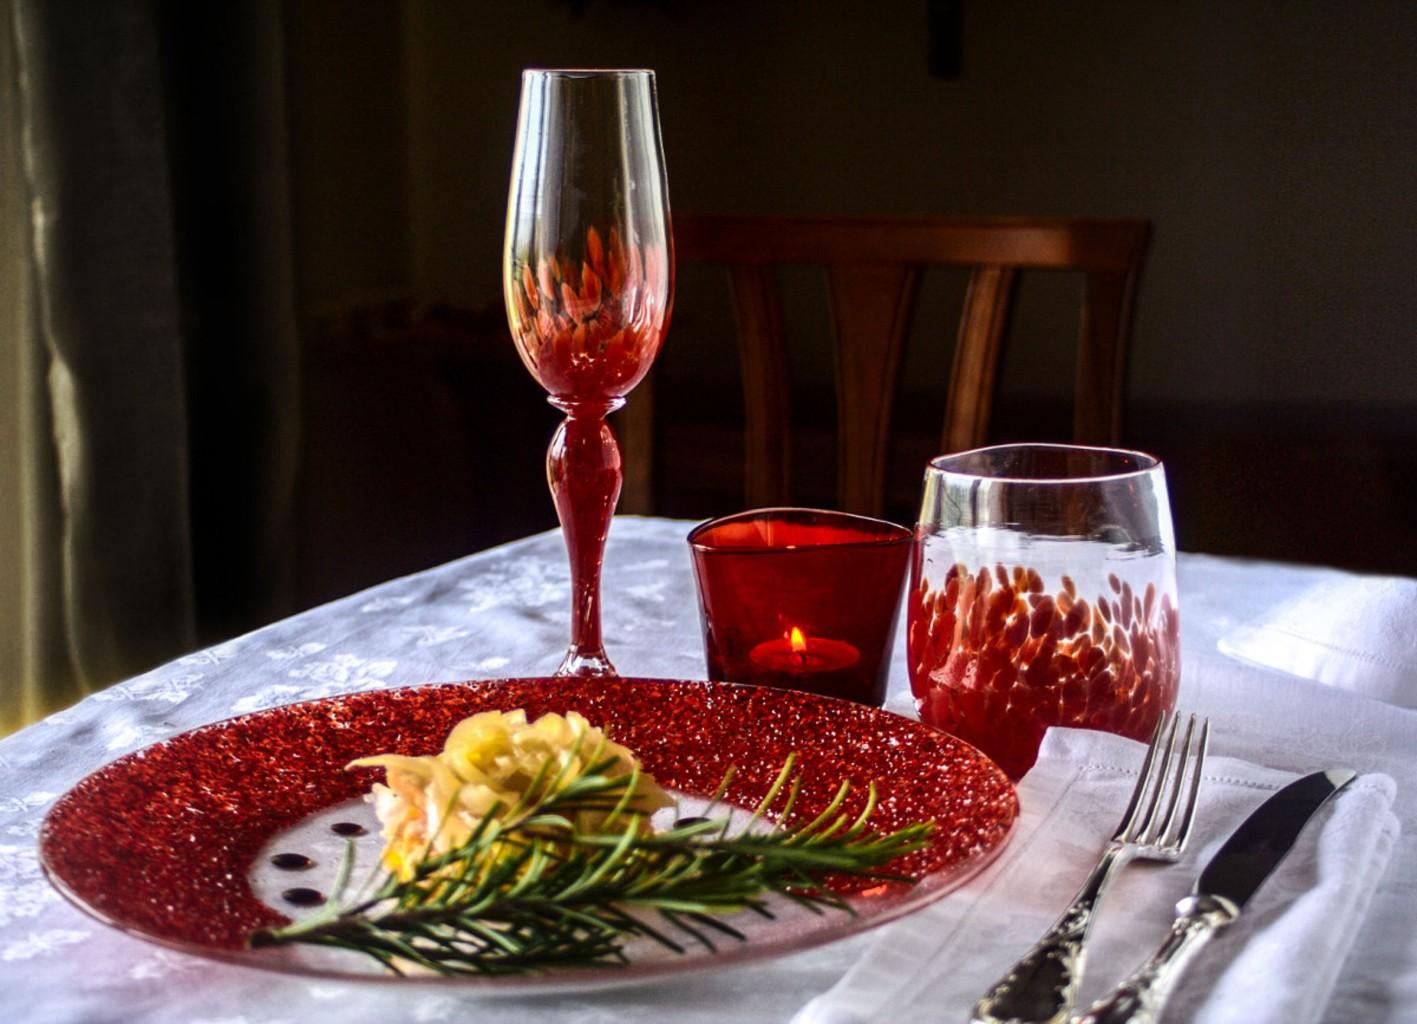 Zucca in saor on Murano Glass set by Abate Zanetti